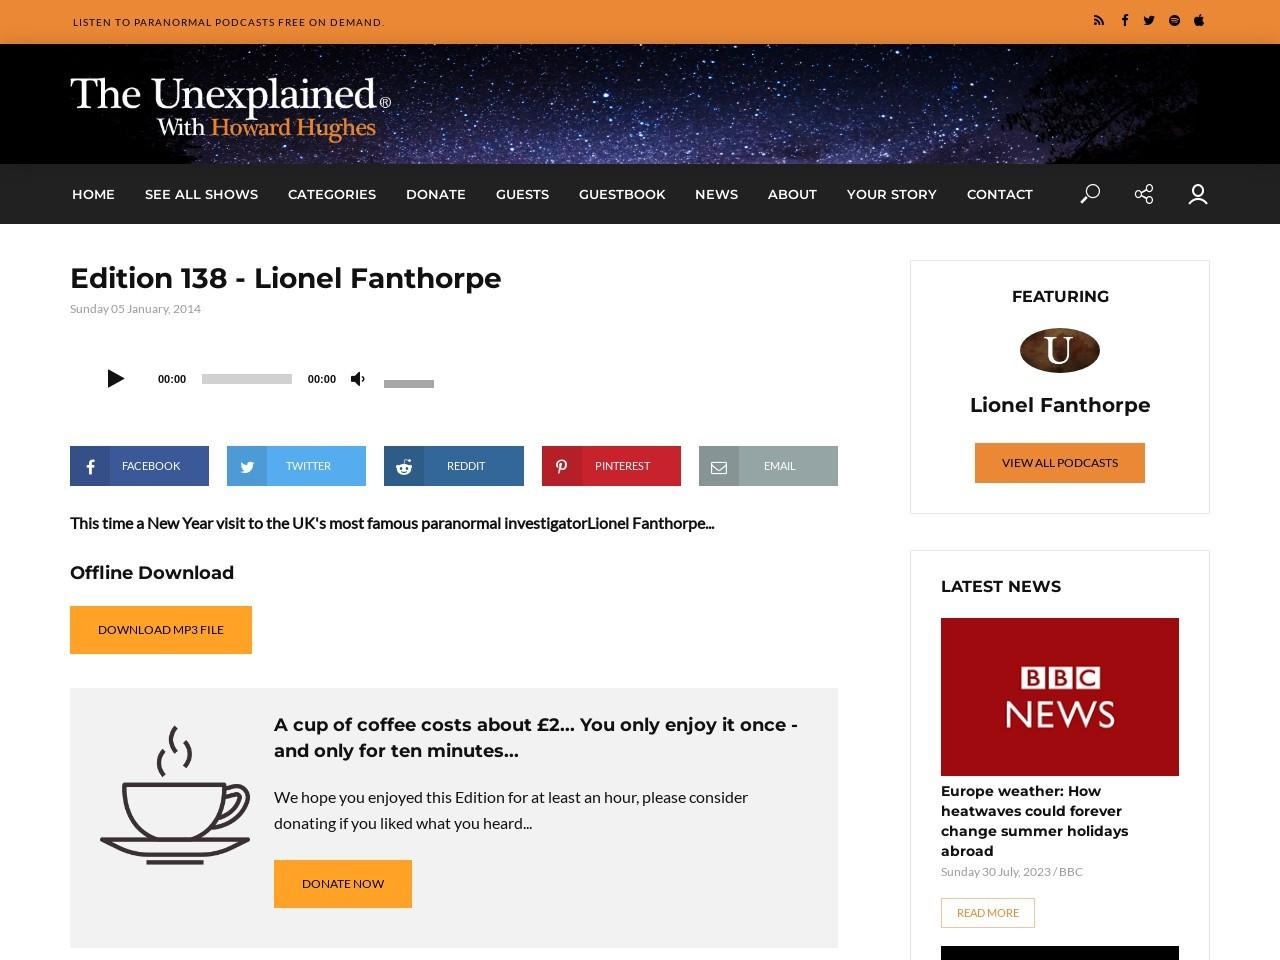 Edition 138 – Lionel Fanthorpe